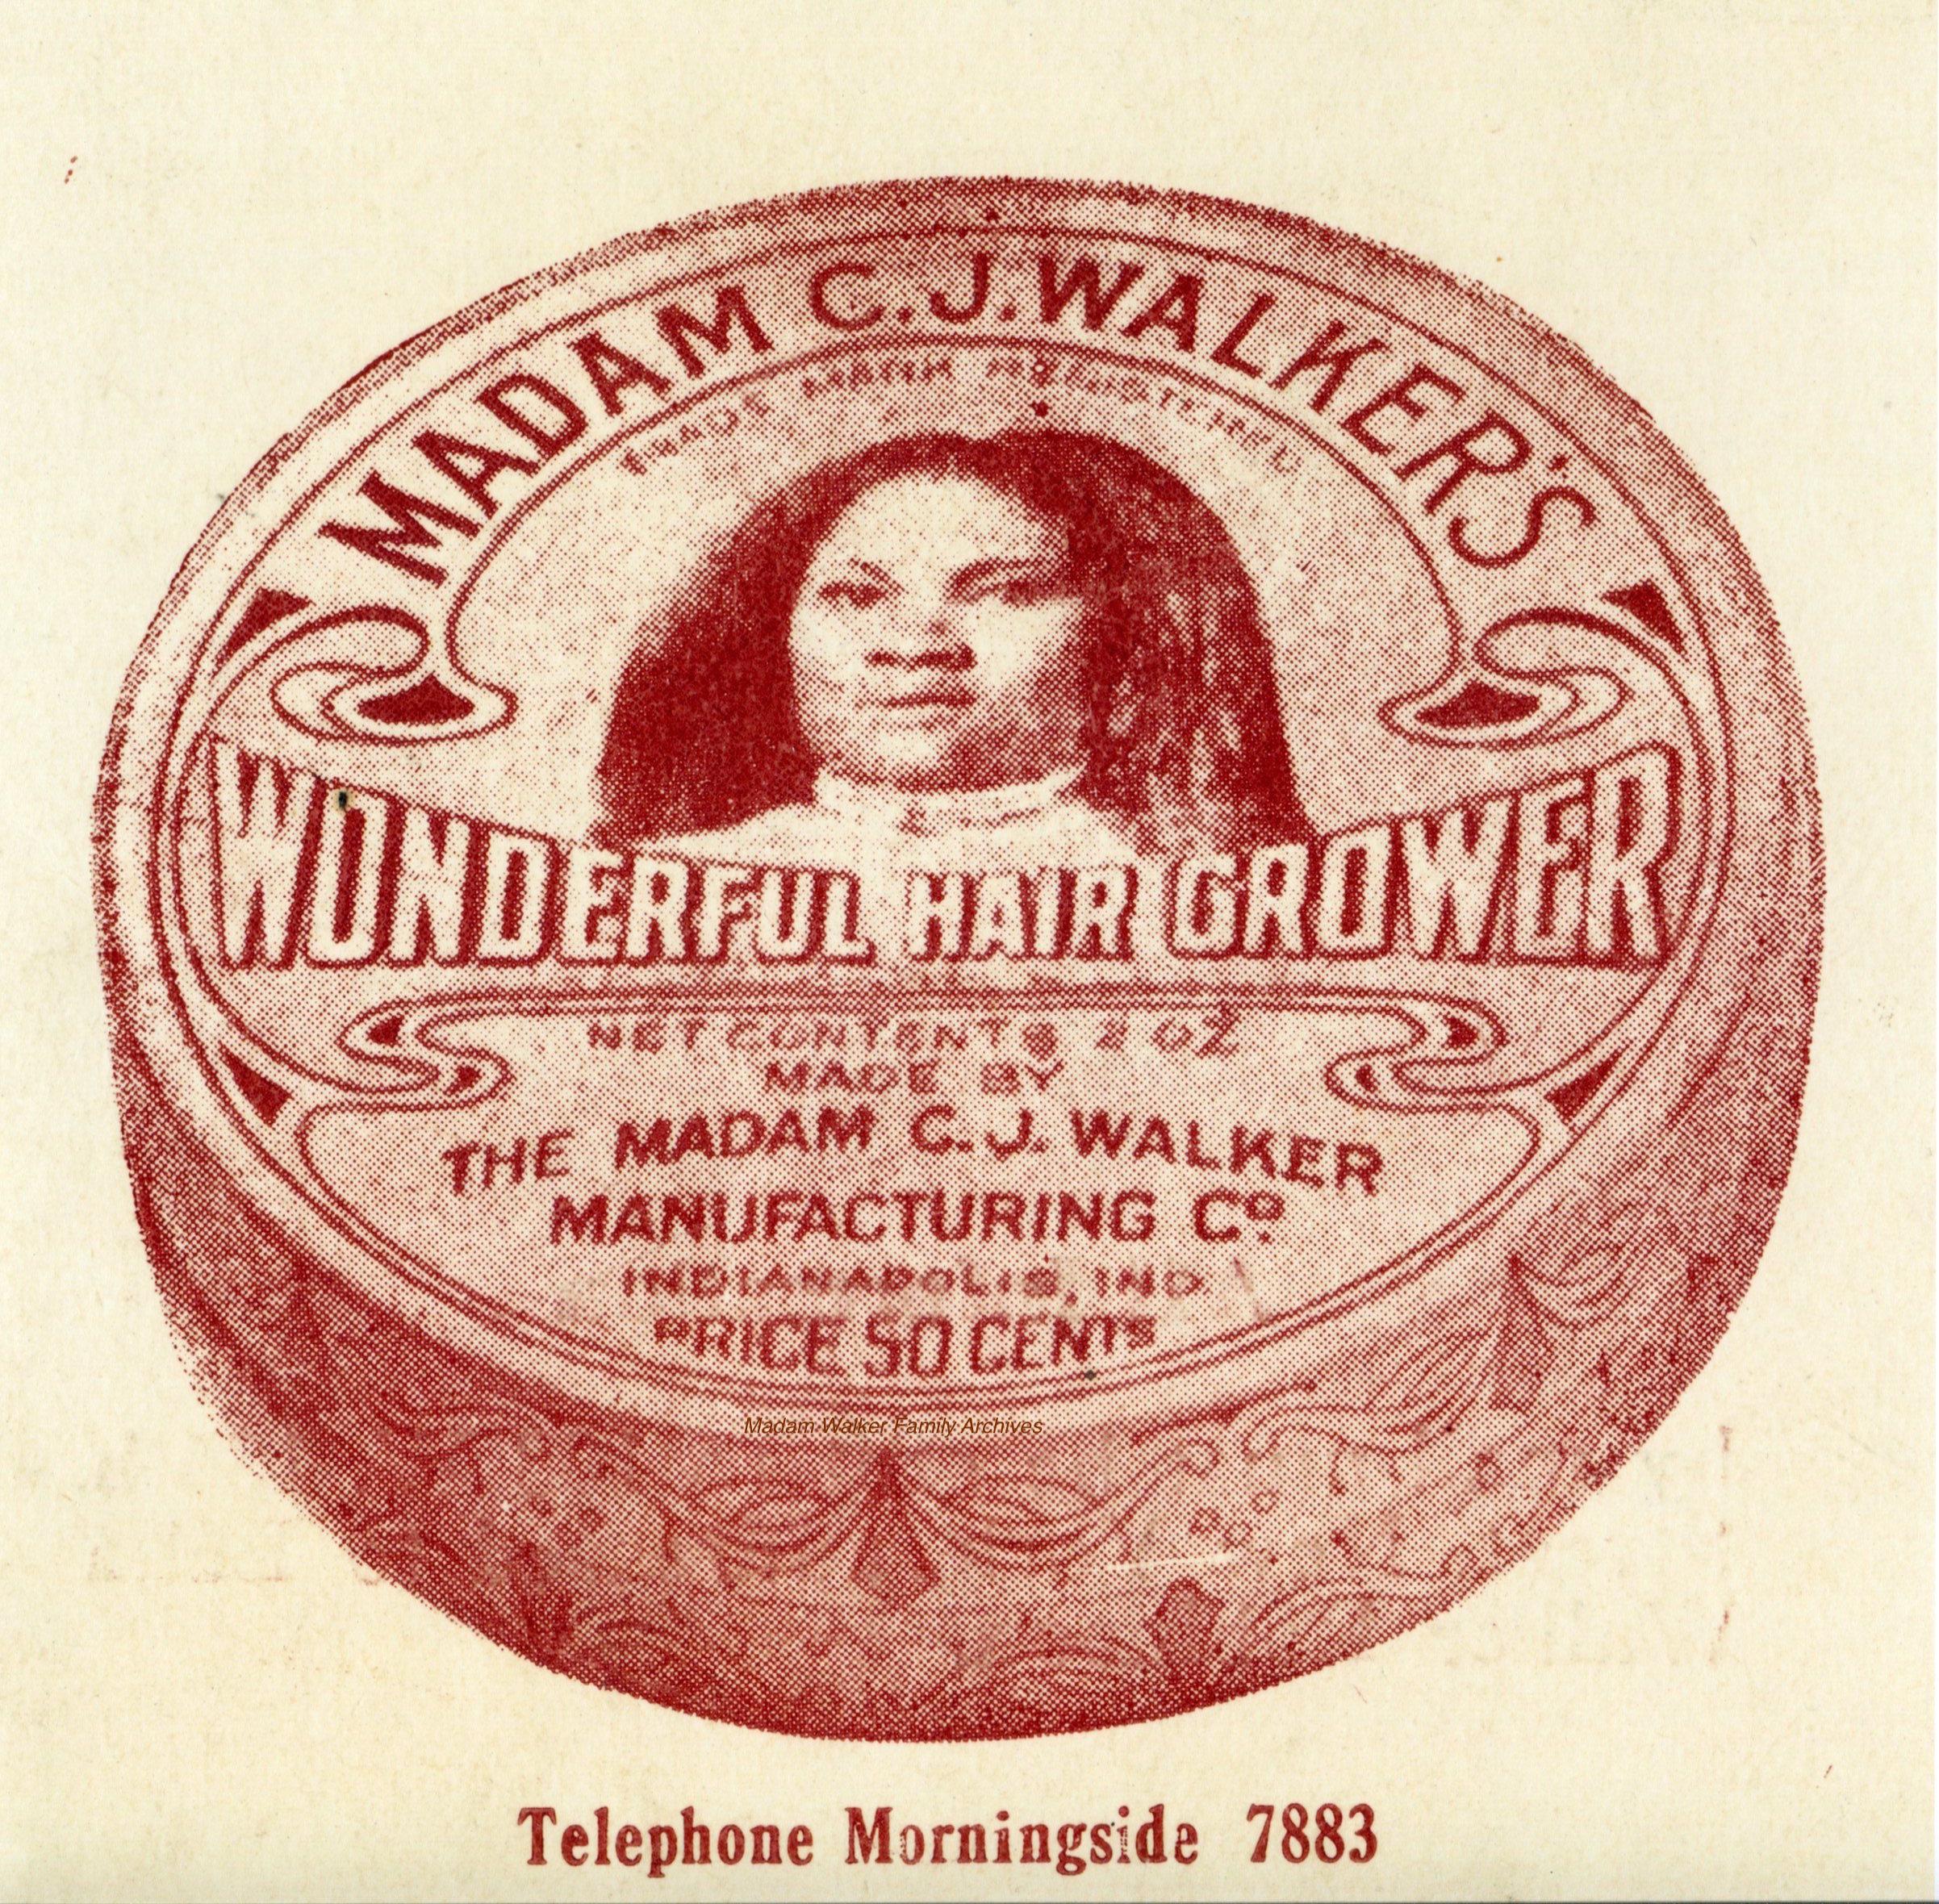 One of Madam C.J. Walker's original products, image courtesy of Madam Walker Family Archives/A'Lelia Bundles.